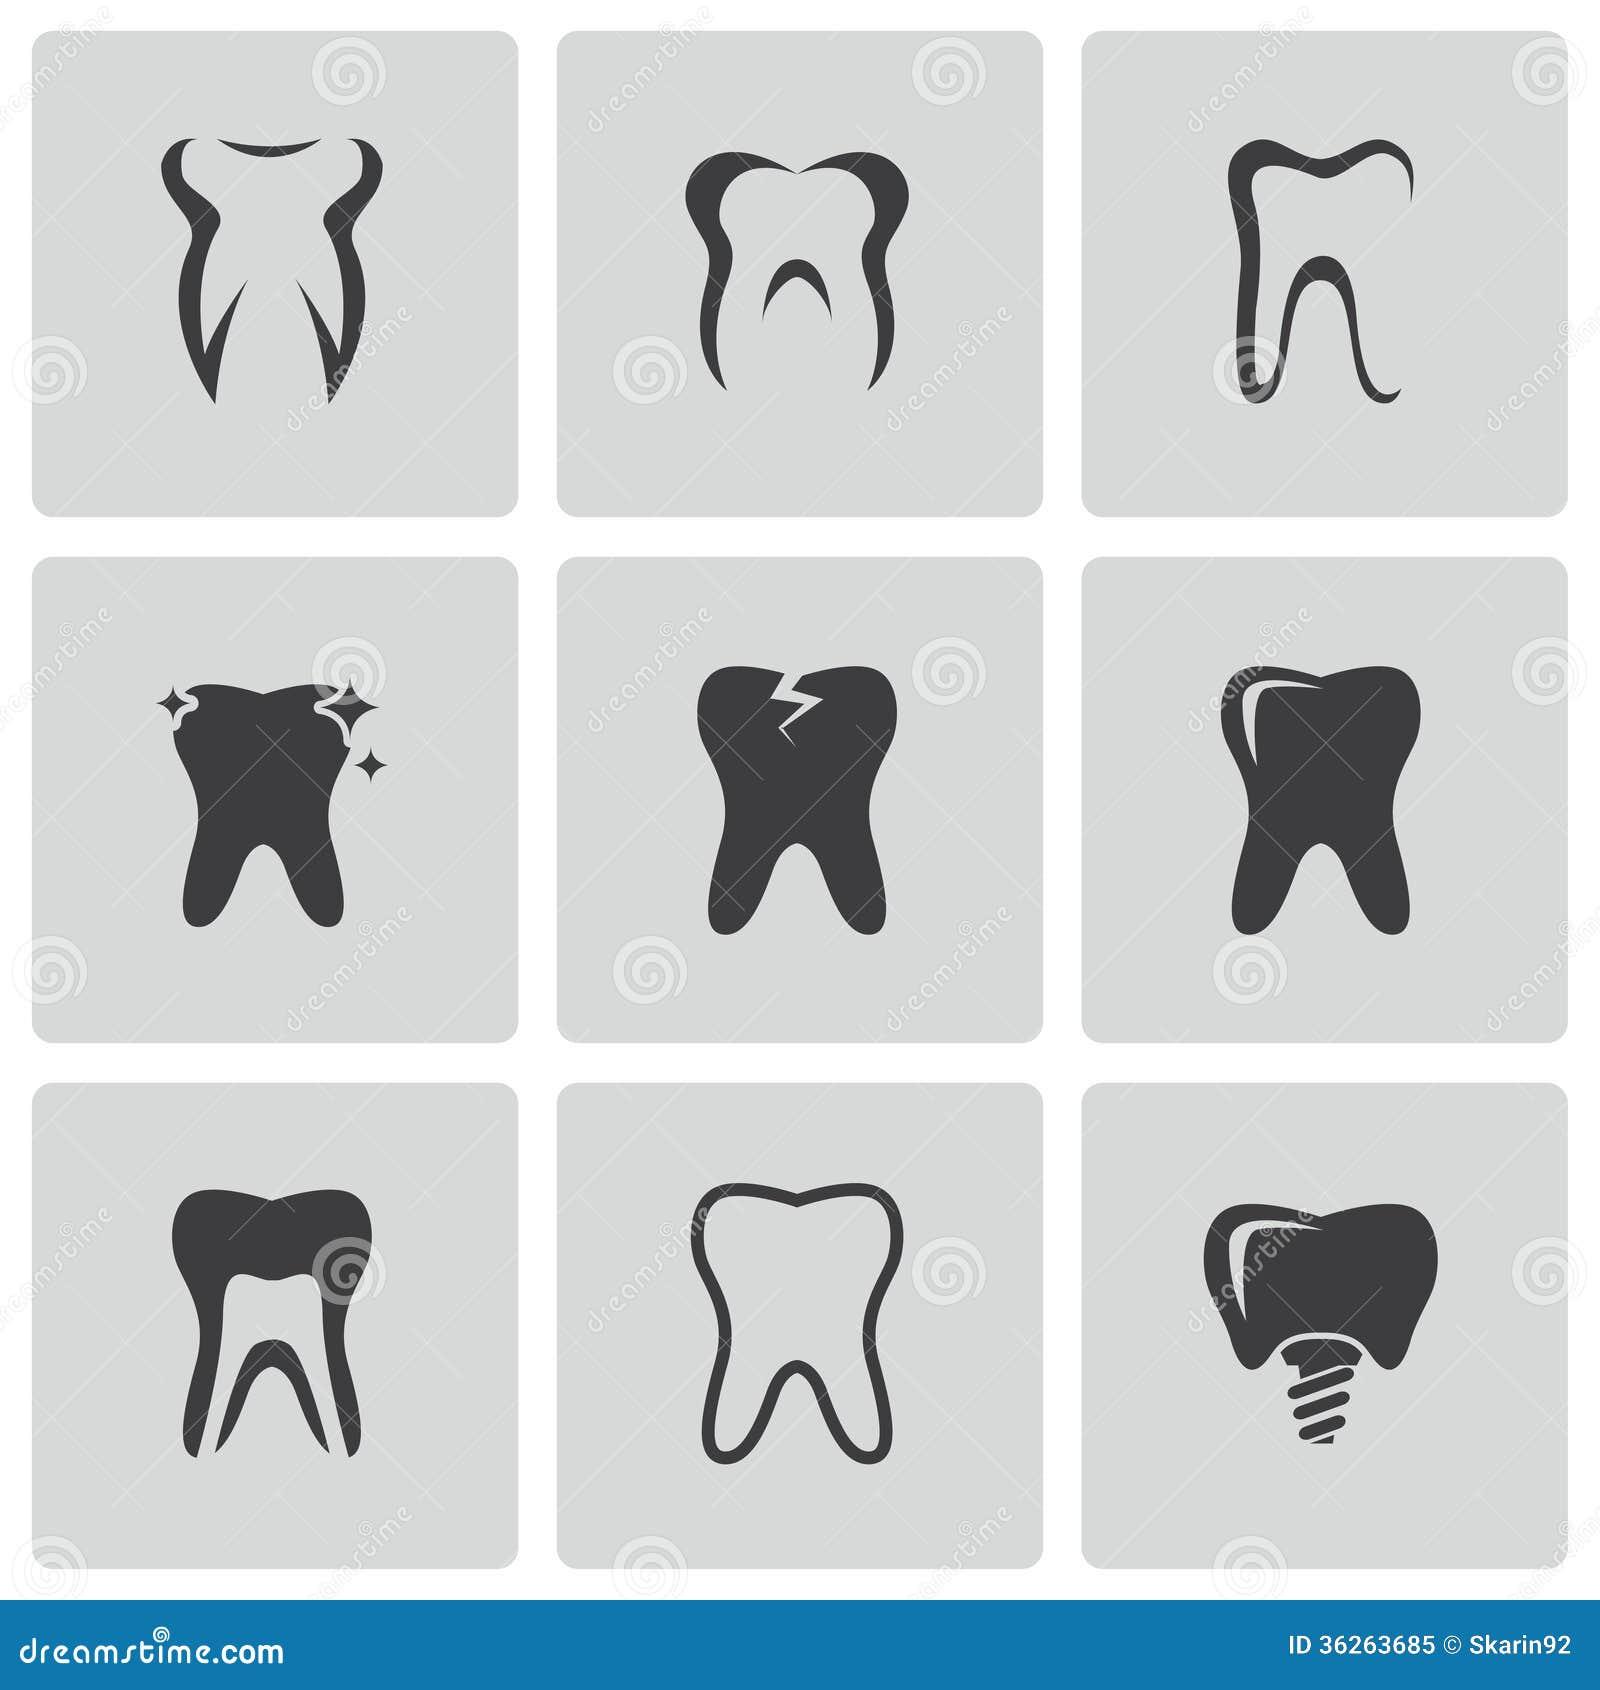 Drawing human ear royalty free stock photography image 25570937 - Vector Black Teeth Icons Set Royalty Free Stock Photo